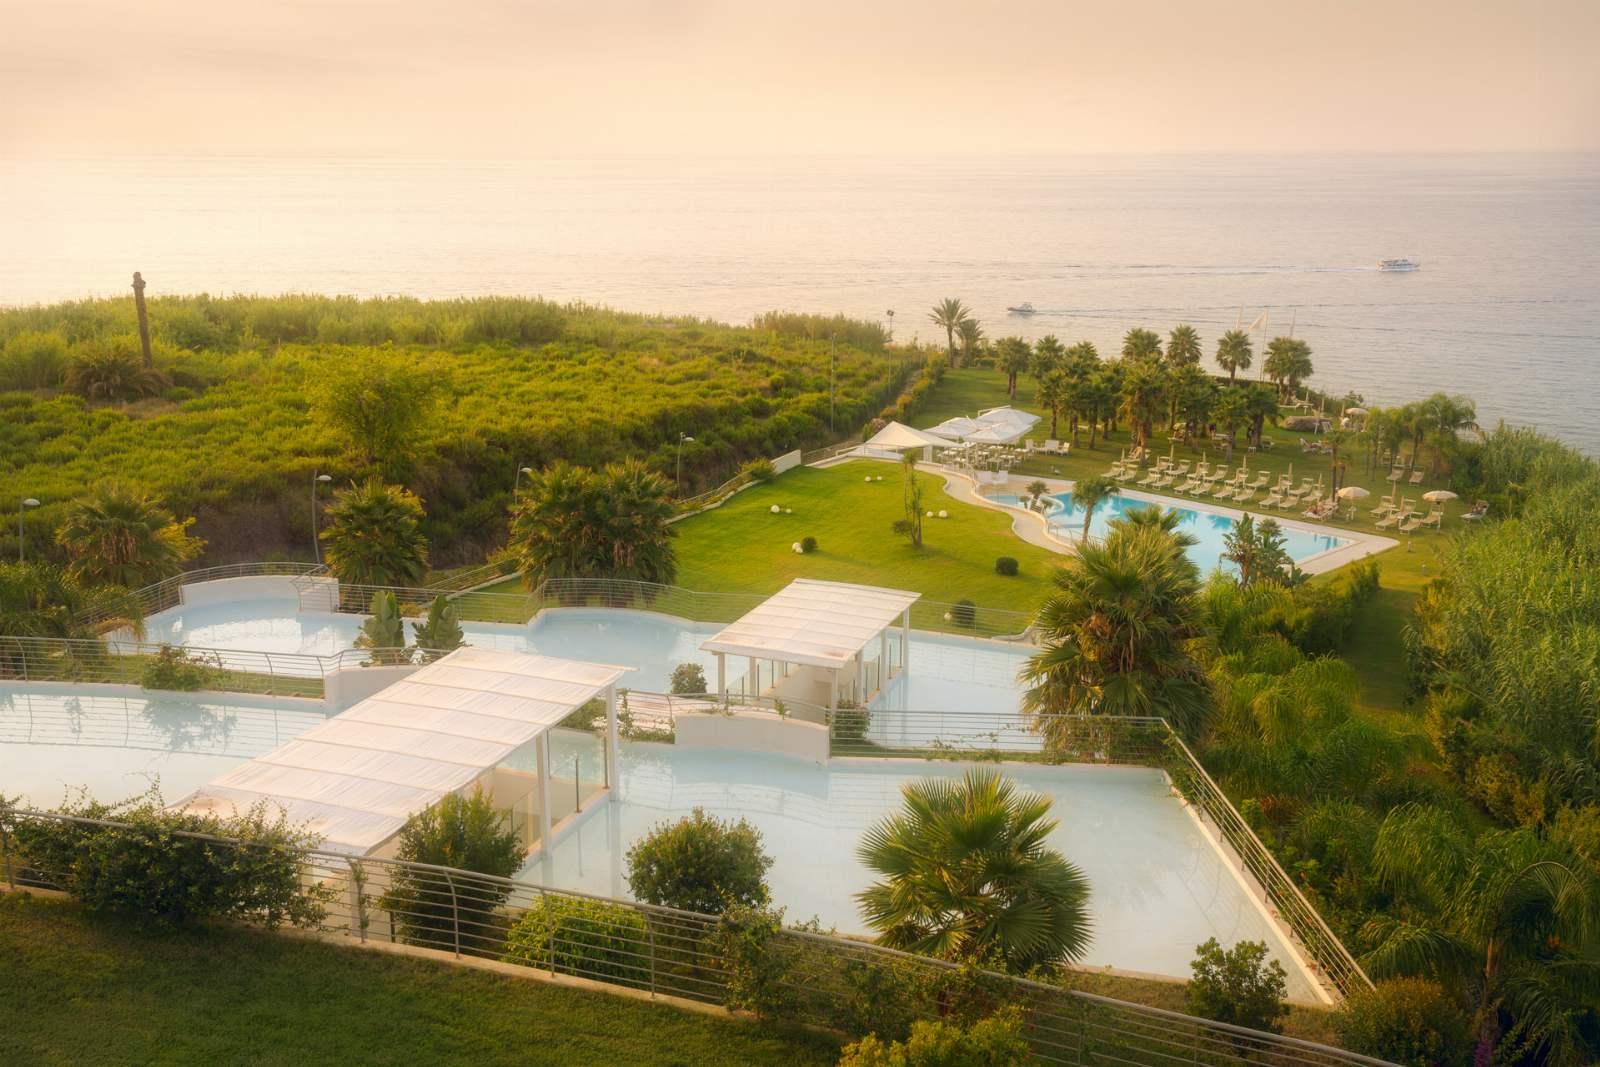 Infinity Resort & Spa: room / property / locale photo. Image 1